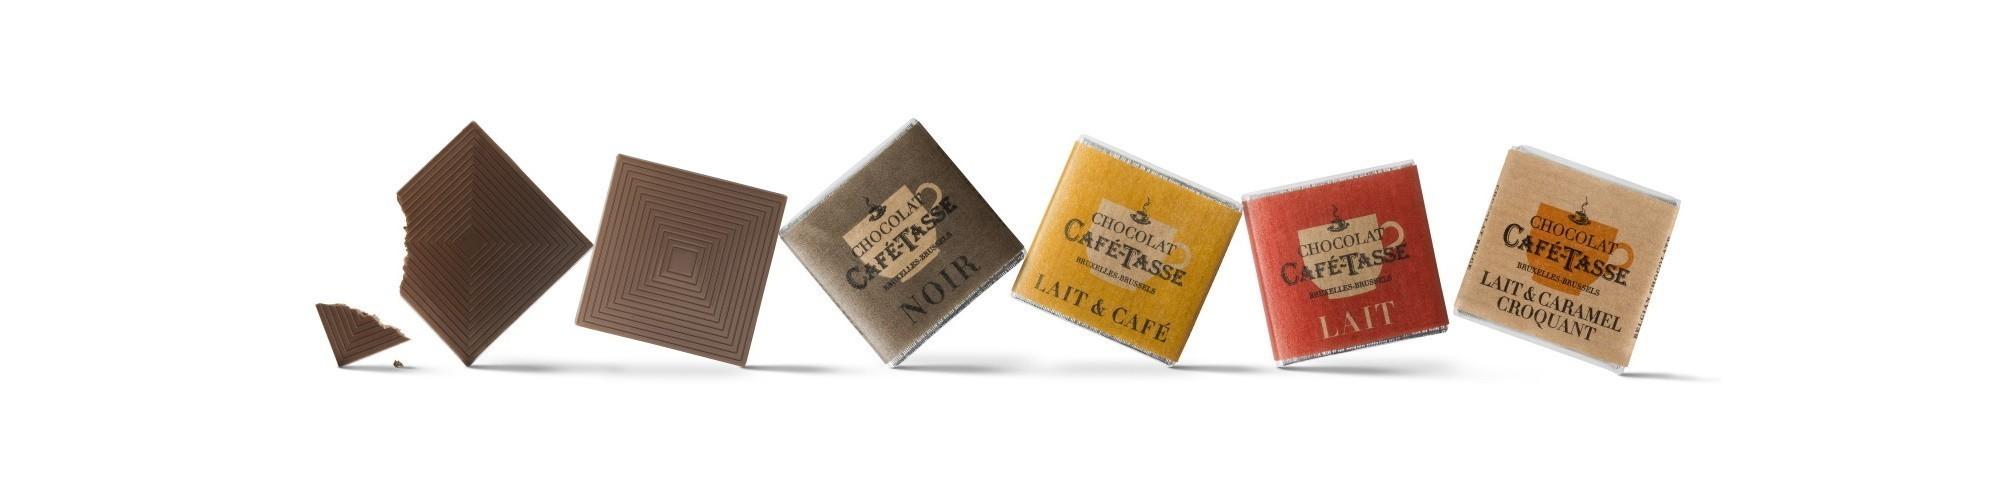 Café - Tasse collectie